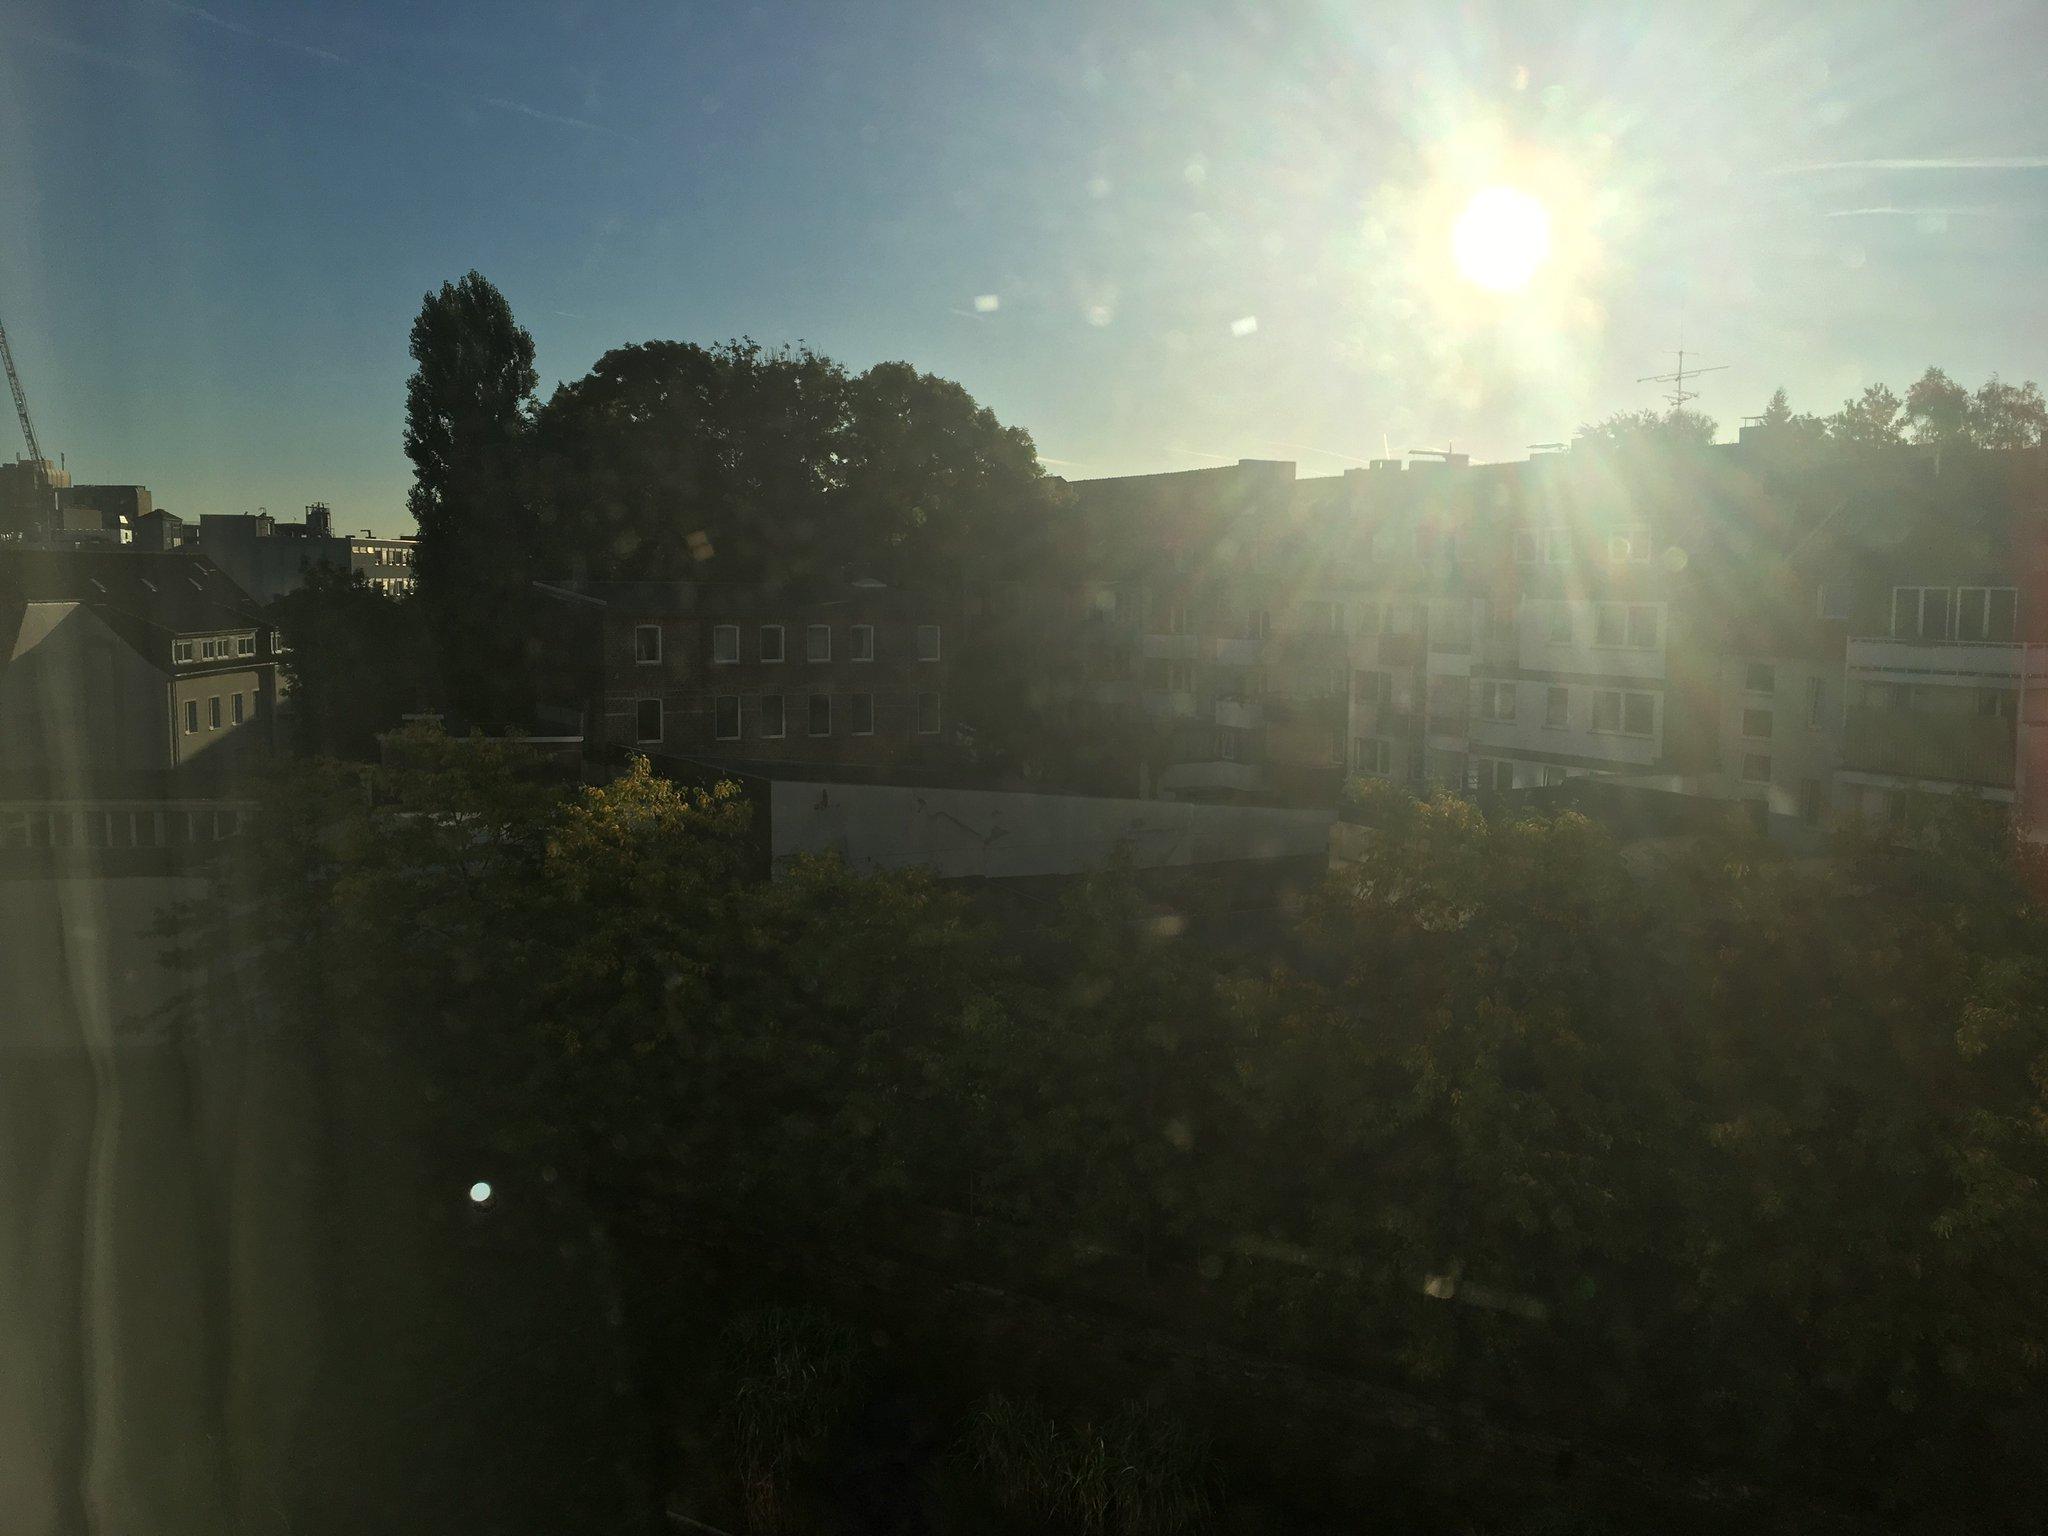 Guten Morge aus Essen #meurers #aussichtstweet https://t.co/YxrMLQ4BVf